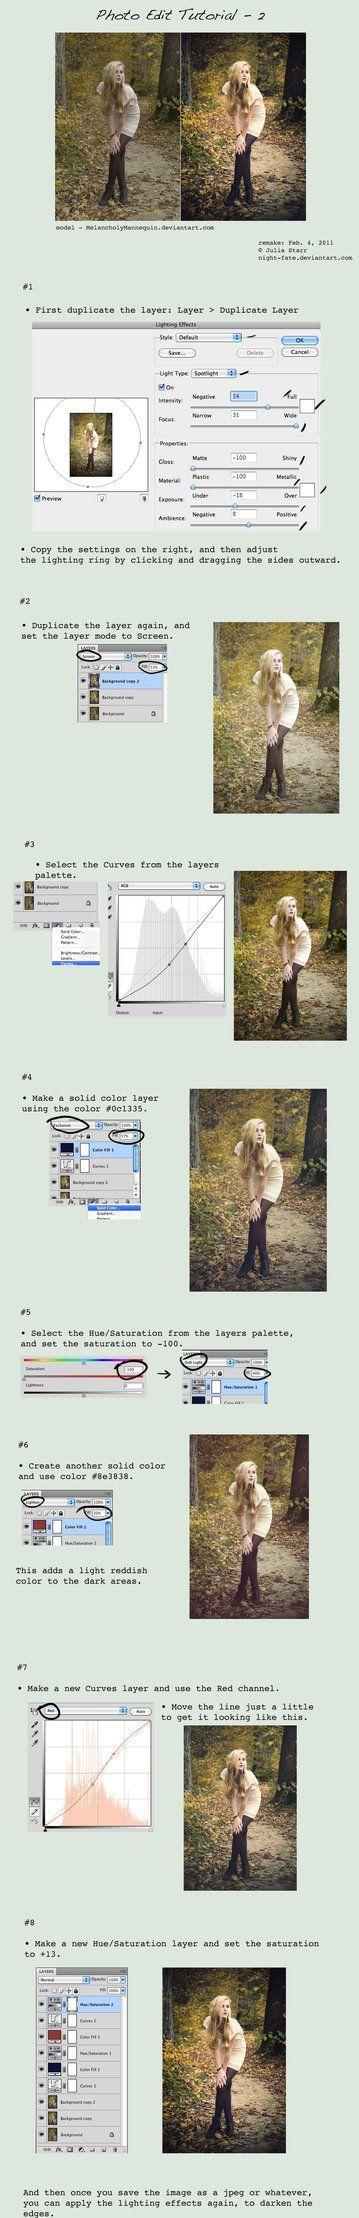 Photo Editing Tutorial